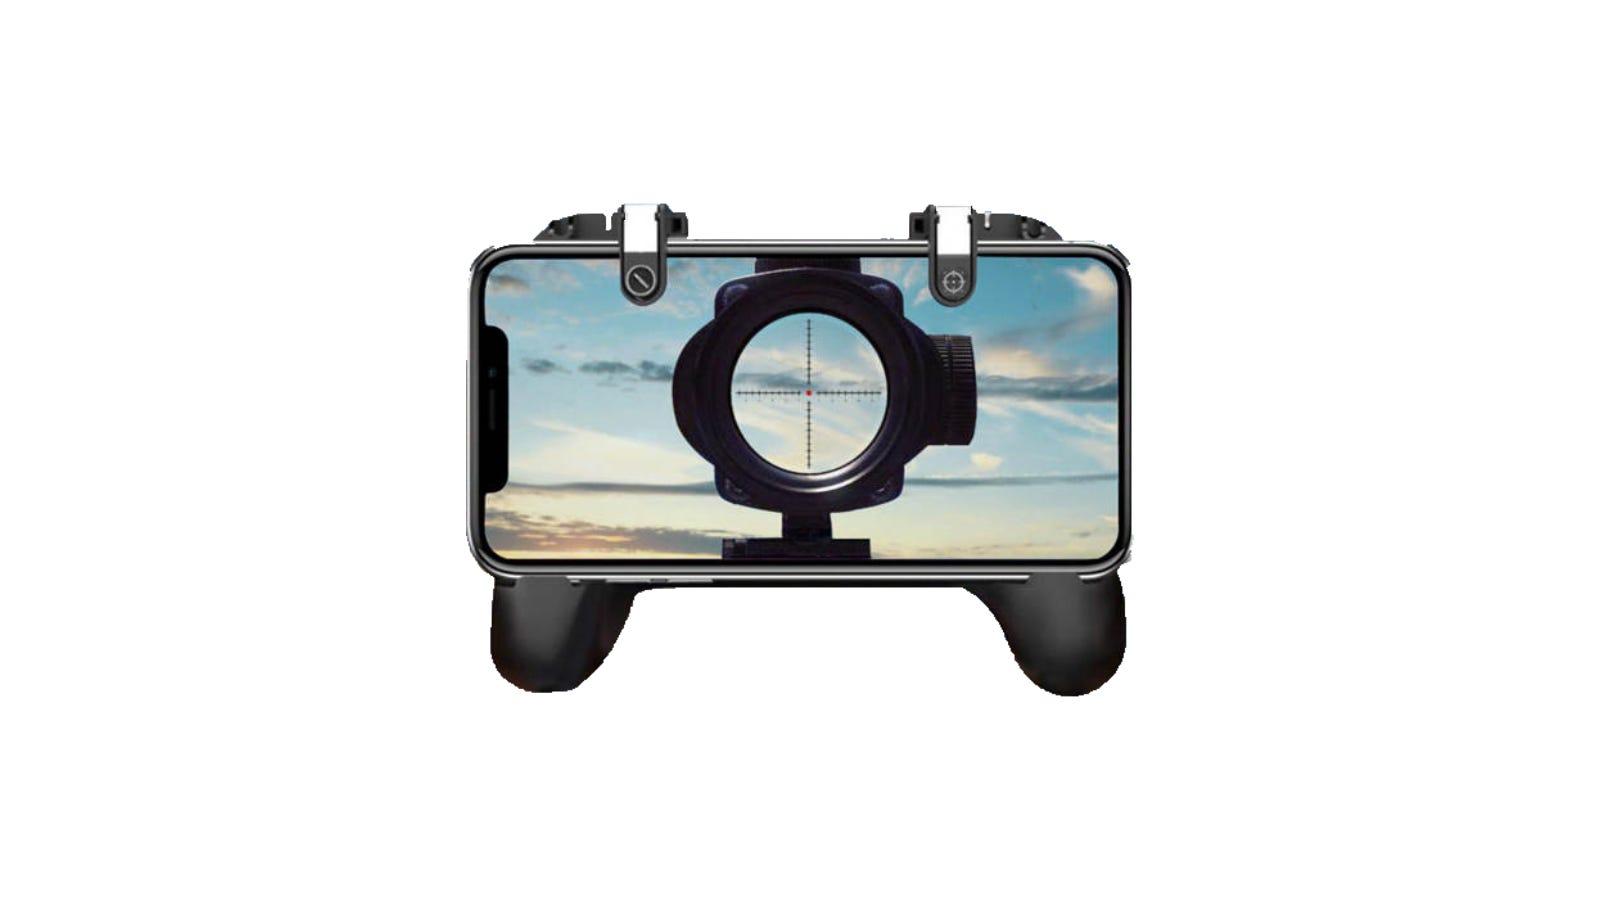 SVIOOG Mobile Game Controller